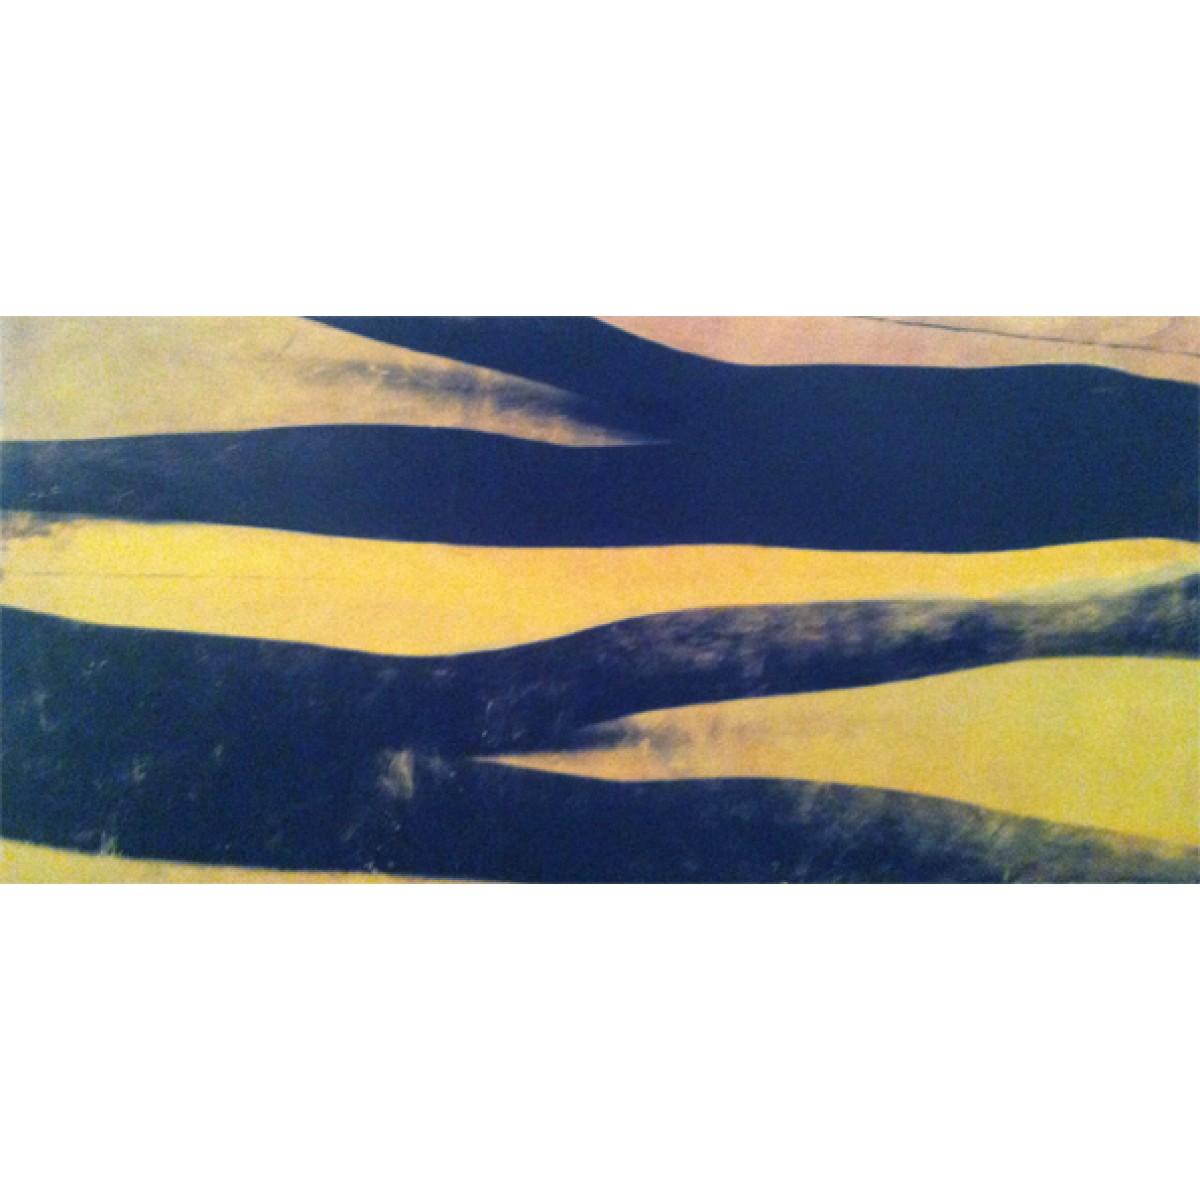 Untitled II, 1998